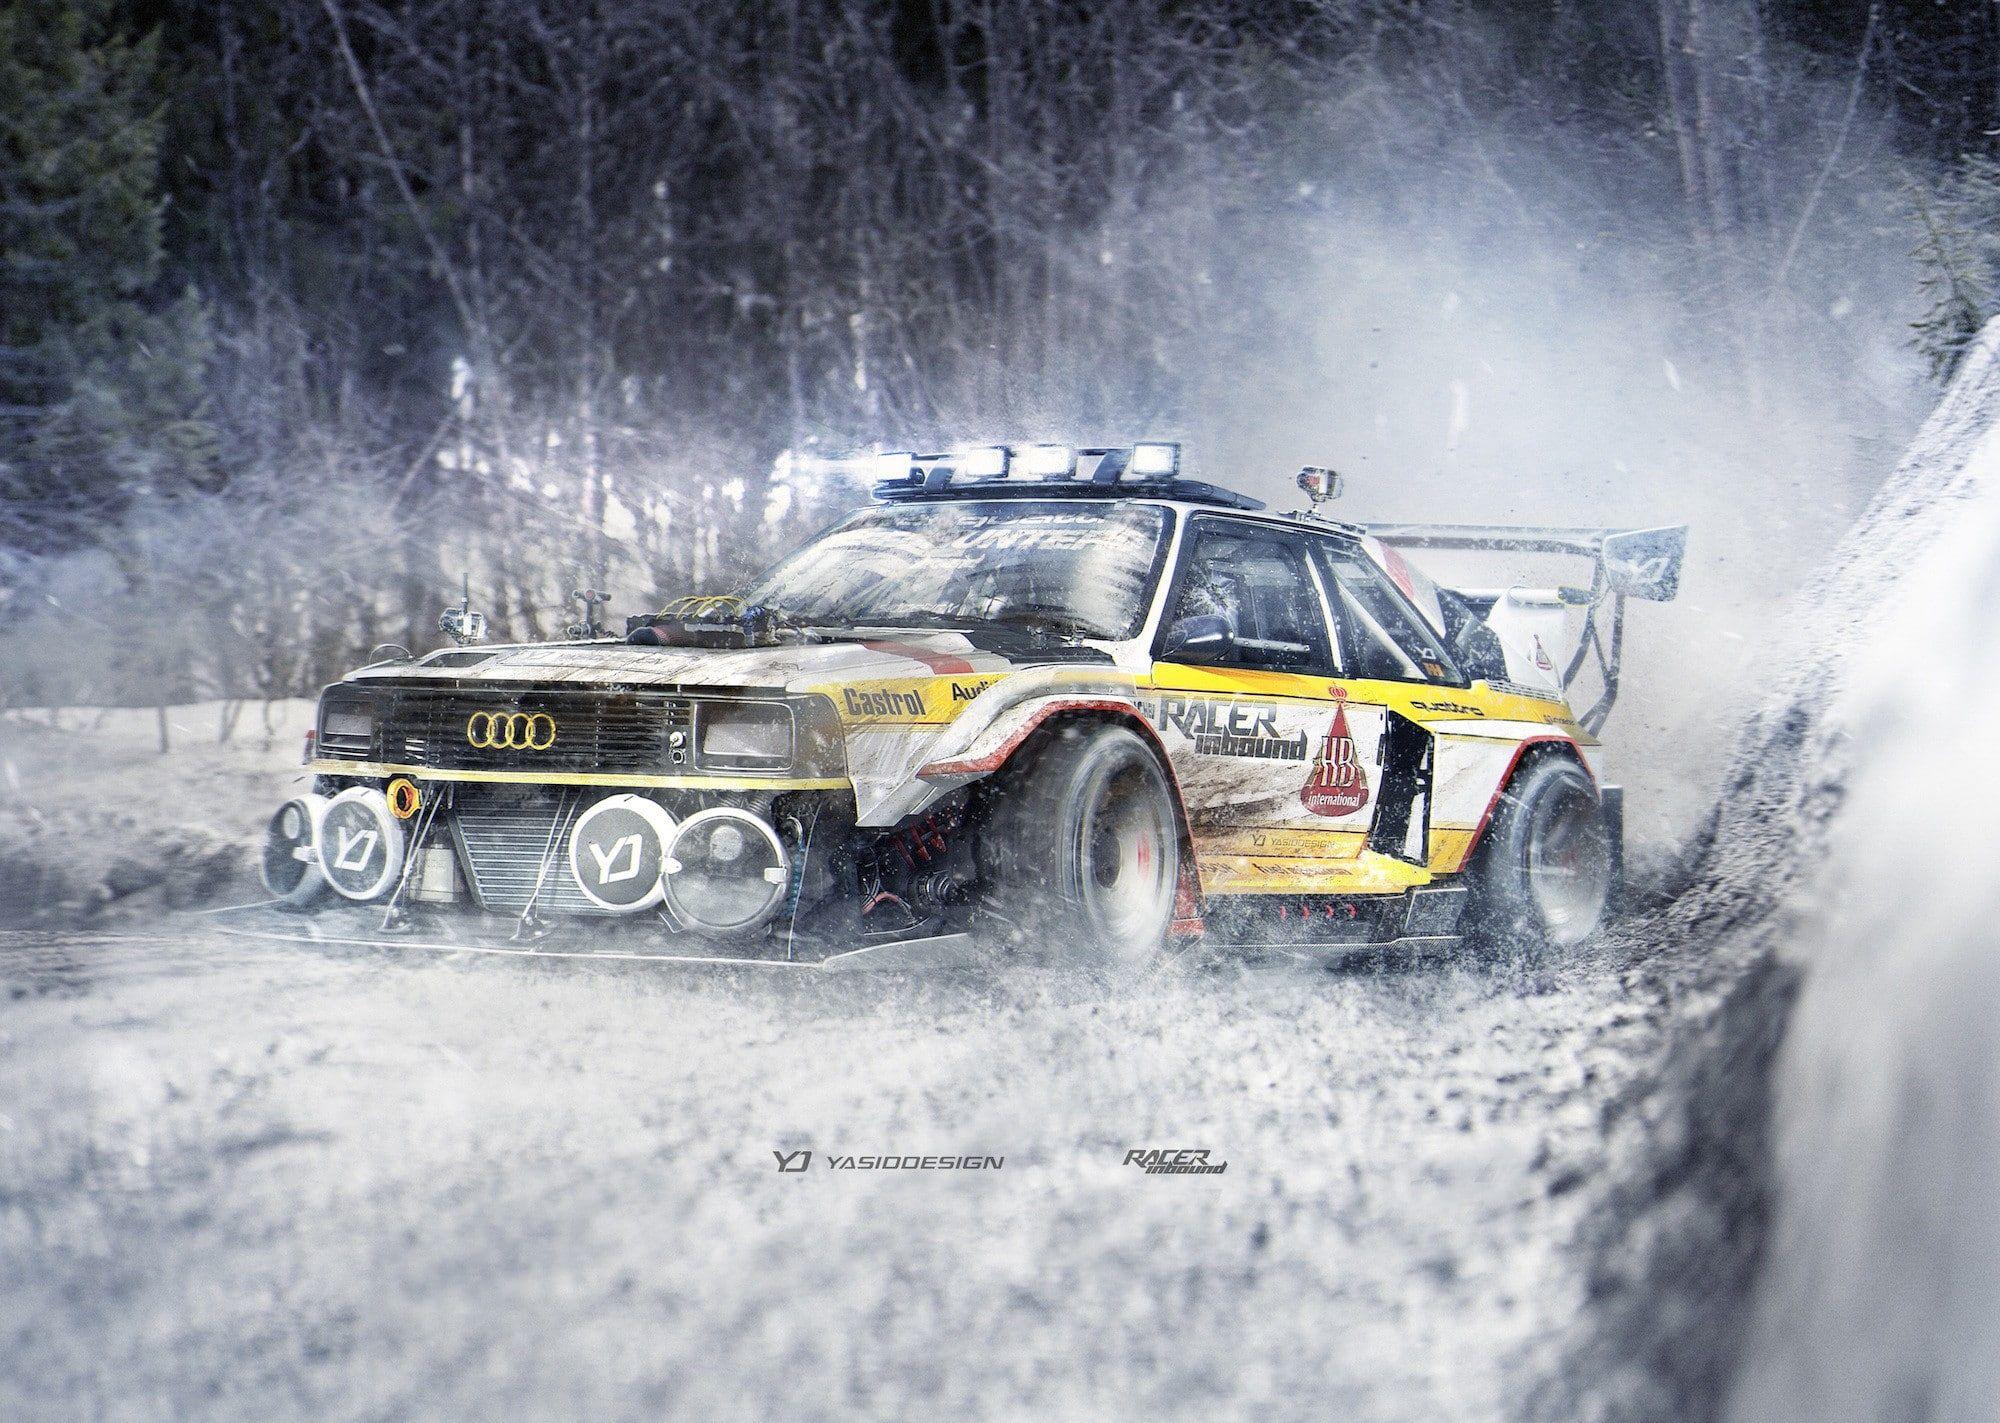 Yasiddesign Render Audi Quattro Audi Rally Cars Car Snow Rally Artwork 1080p Wallpaper Hdwallpaper Desktop Audi Quattro Audi Black Audi